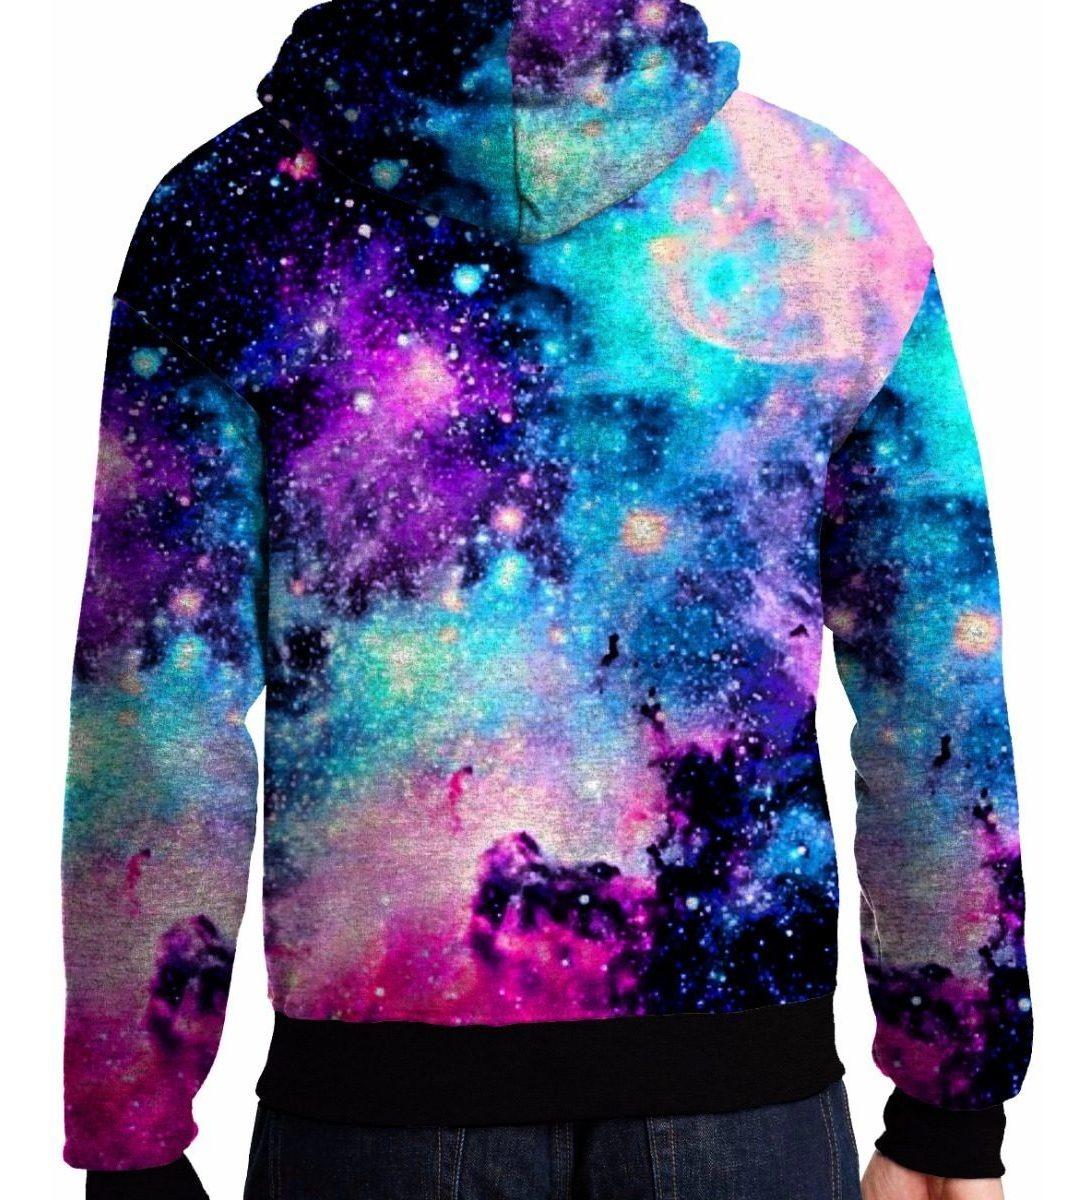 Blusa Moletom Galaxia Nebulosa Universo Unissex Tumblr Pop R